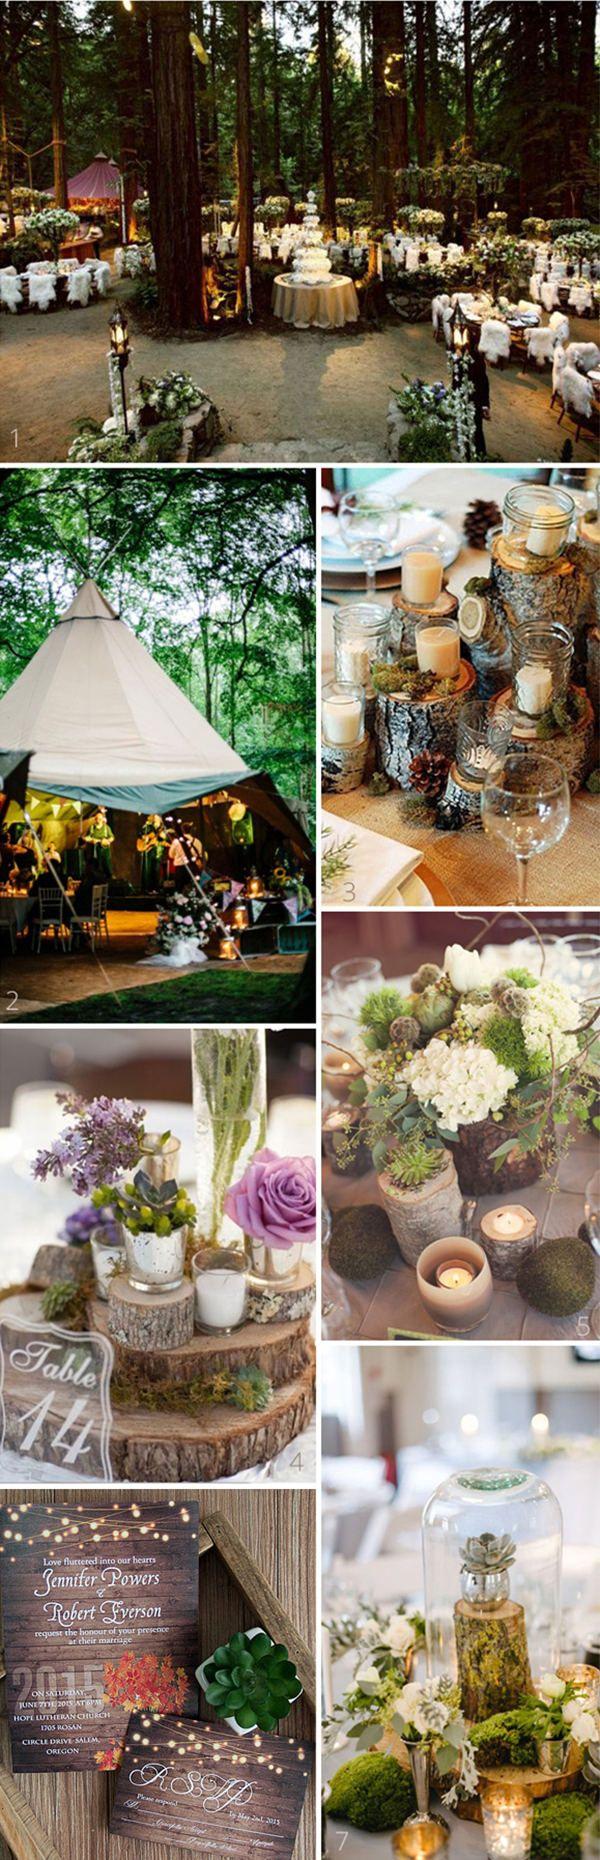 28 Whimsical And Chic Woodland Wedding Ideas